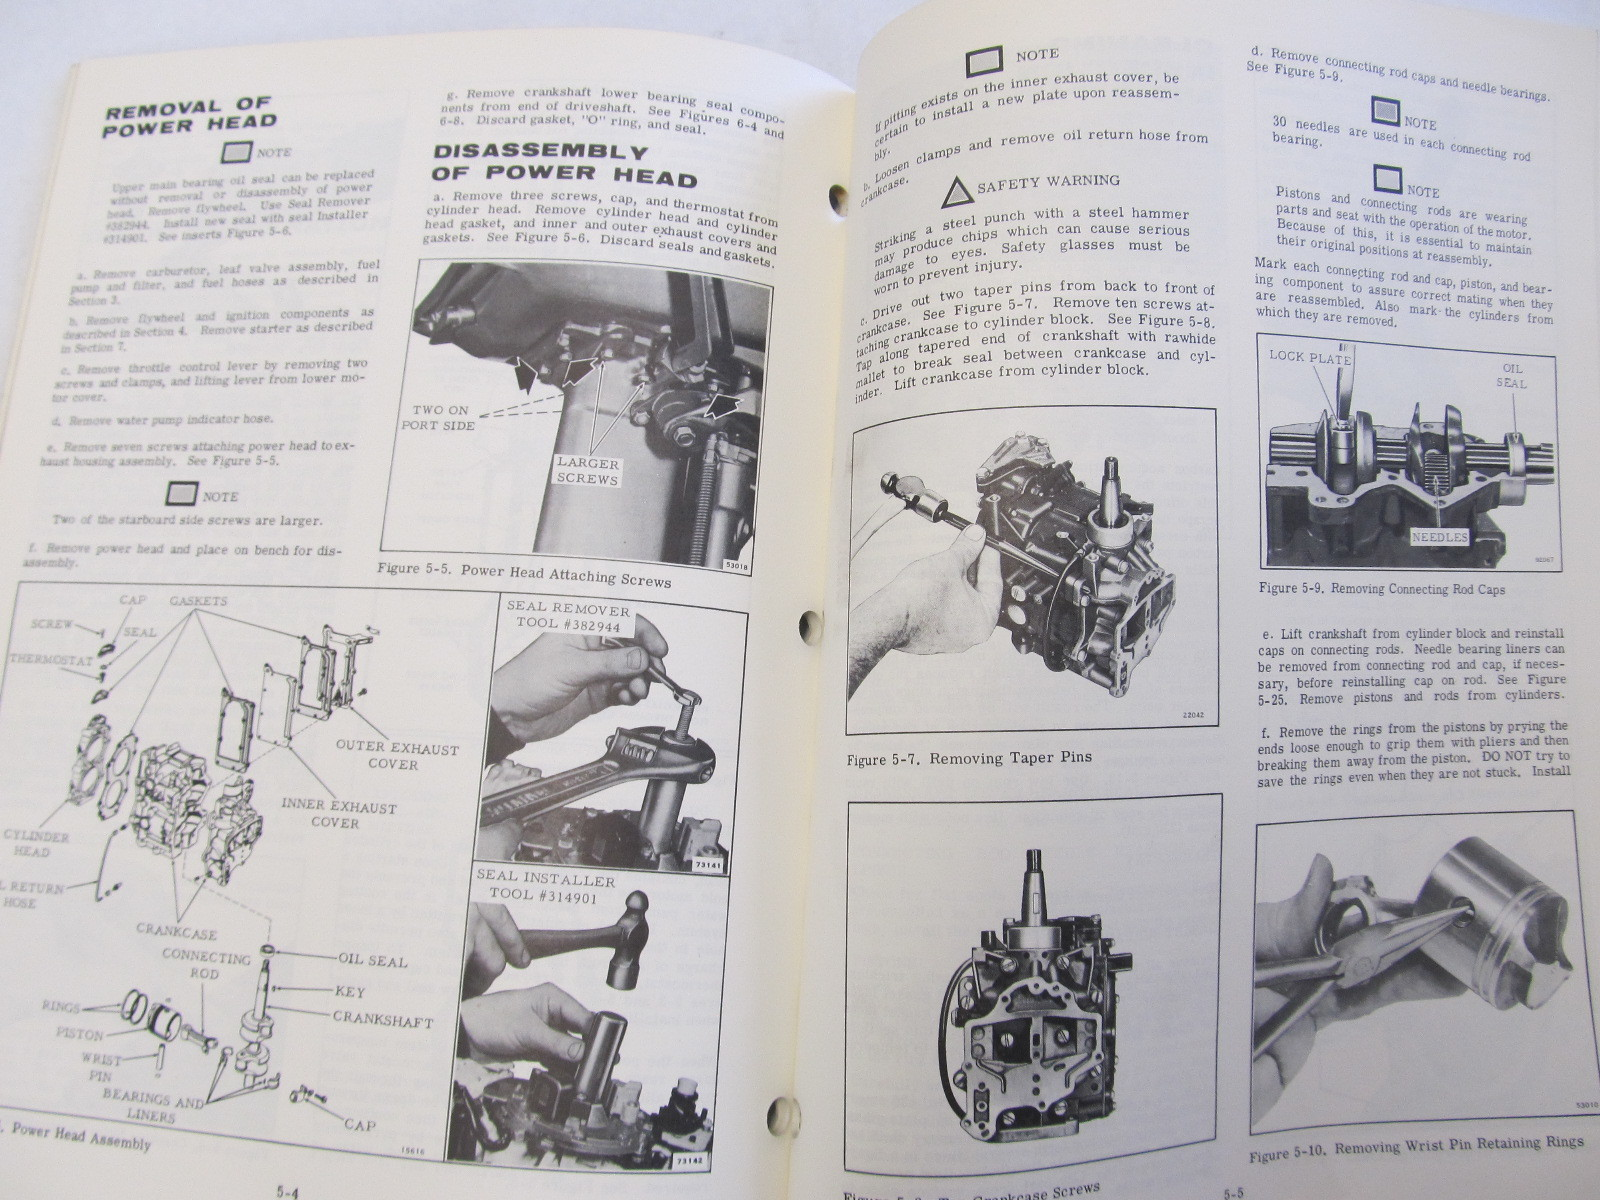 1979 Johnson Outboard Service Manual 6 Hp 6r79 6rl79